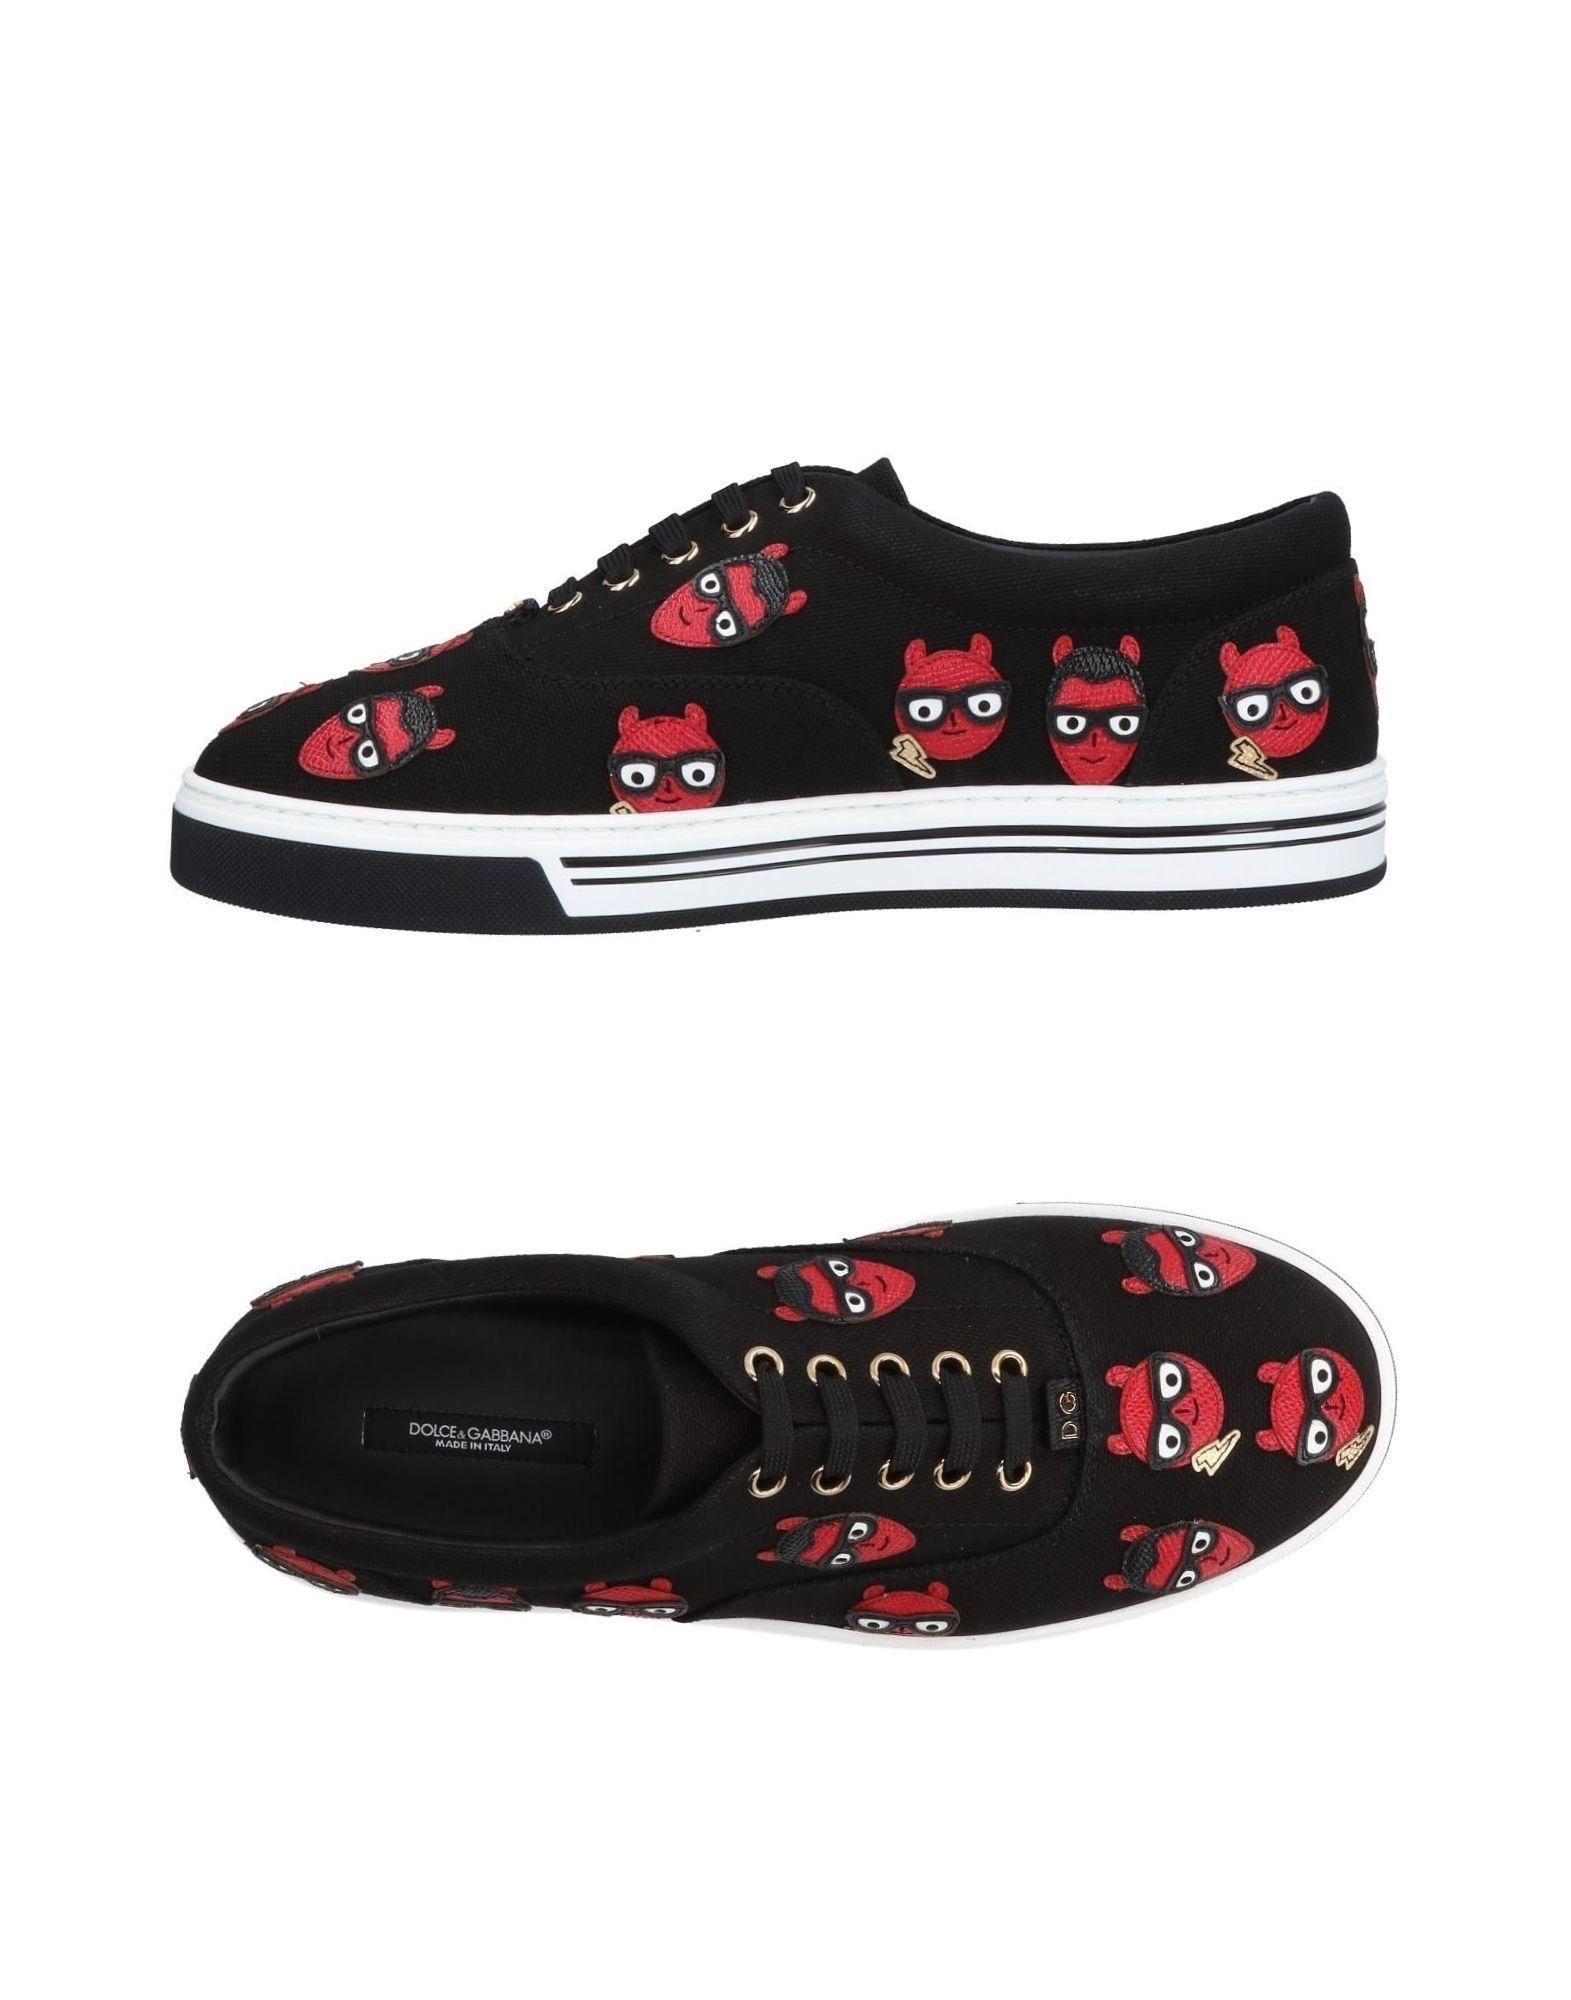 Dolce & Gabbana Sneakers Herren  11462330TD Gute Qualität beliebte Schuhe